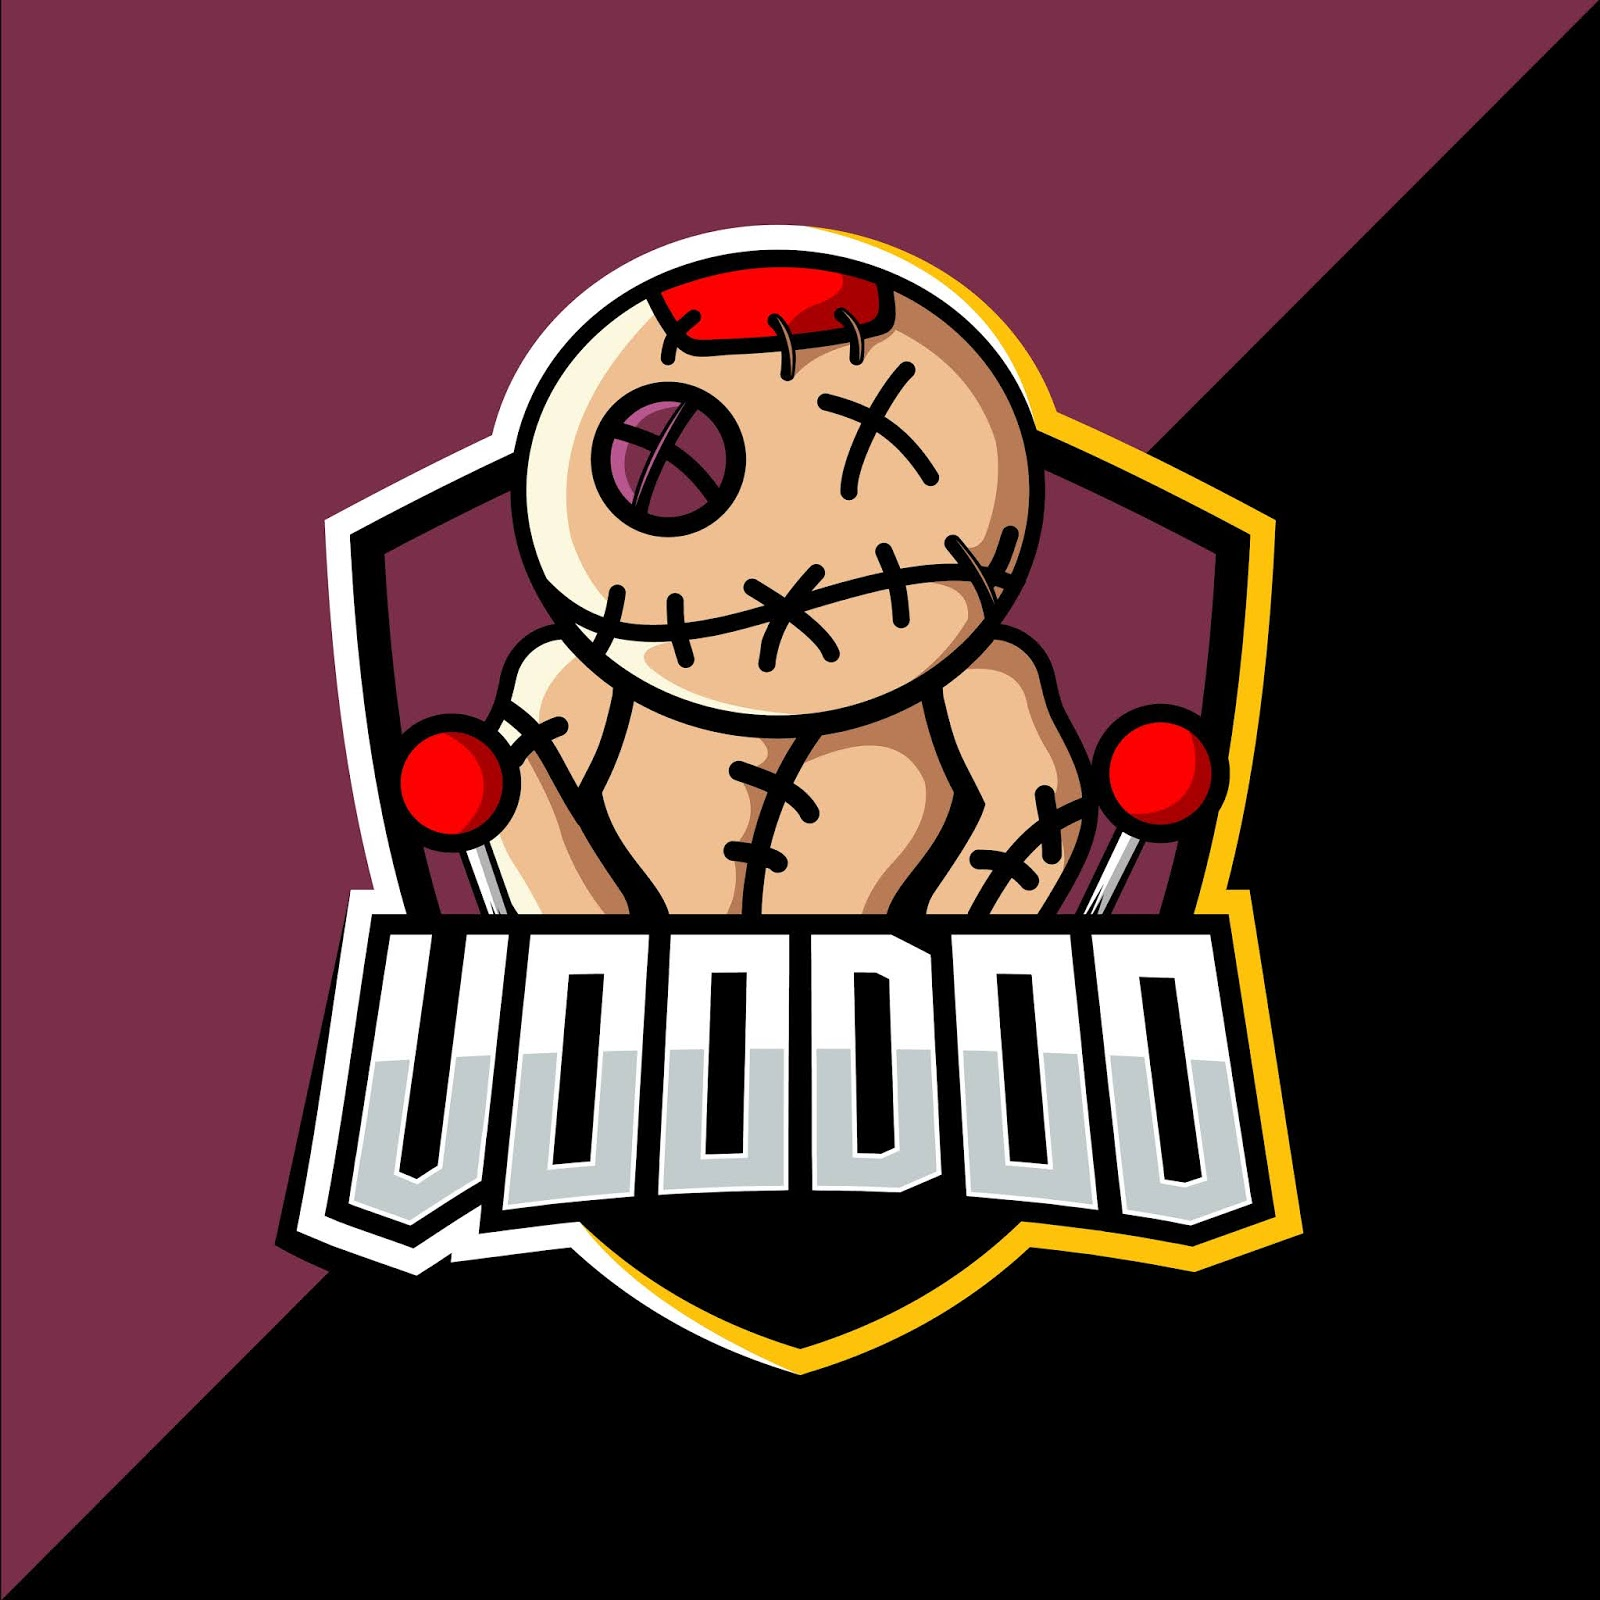 Voodoo Esport Mascot Logo Design Free Download Vector CDR, AI, EPS and PNG Formats